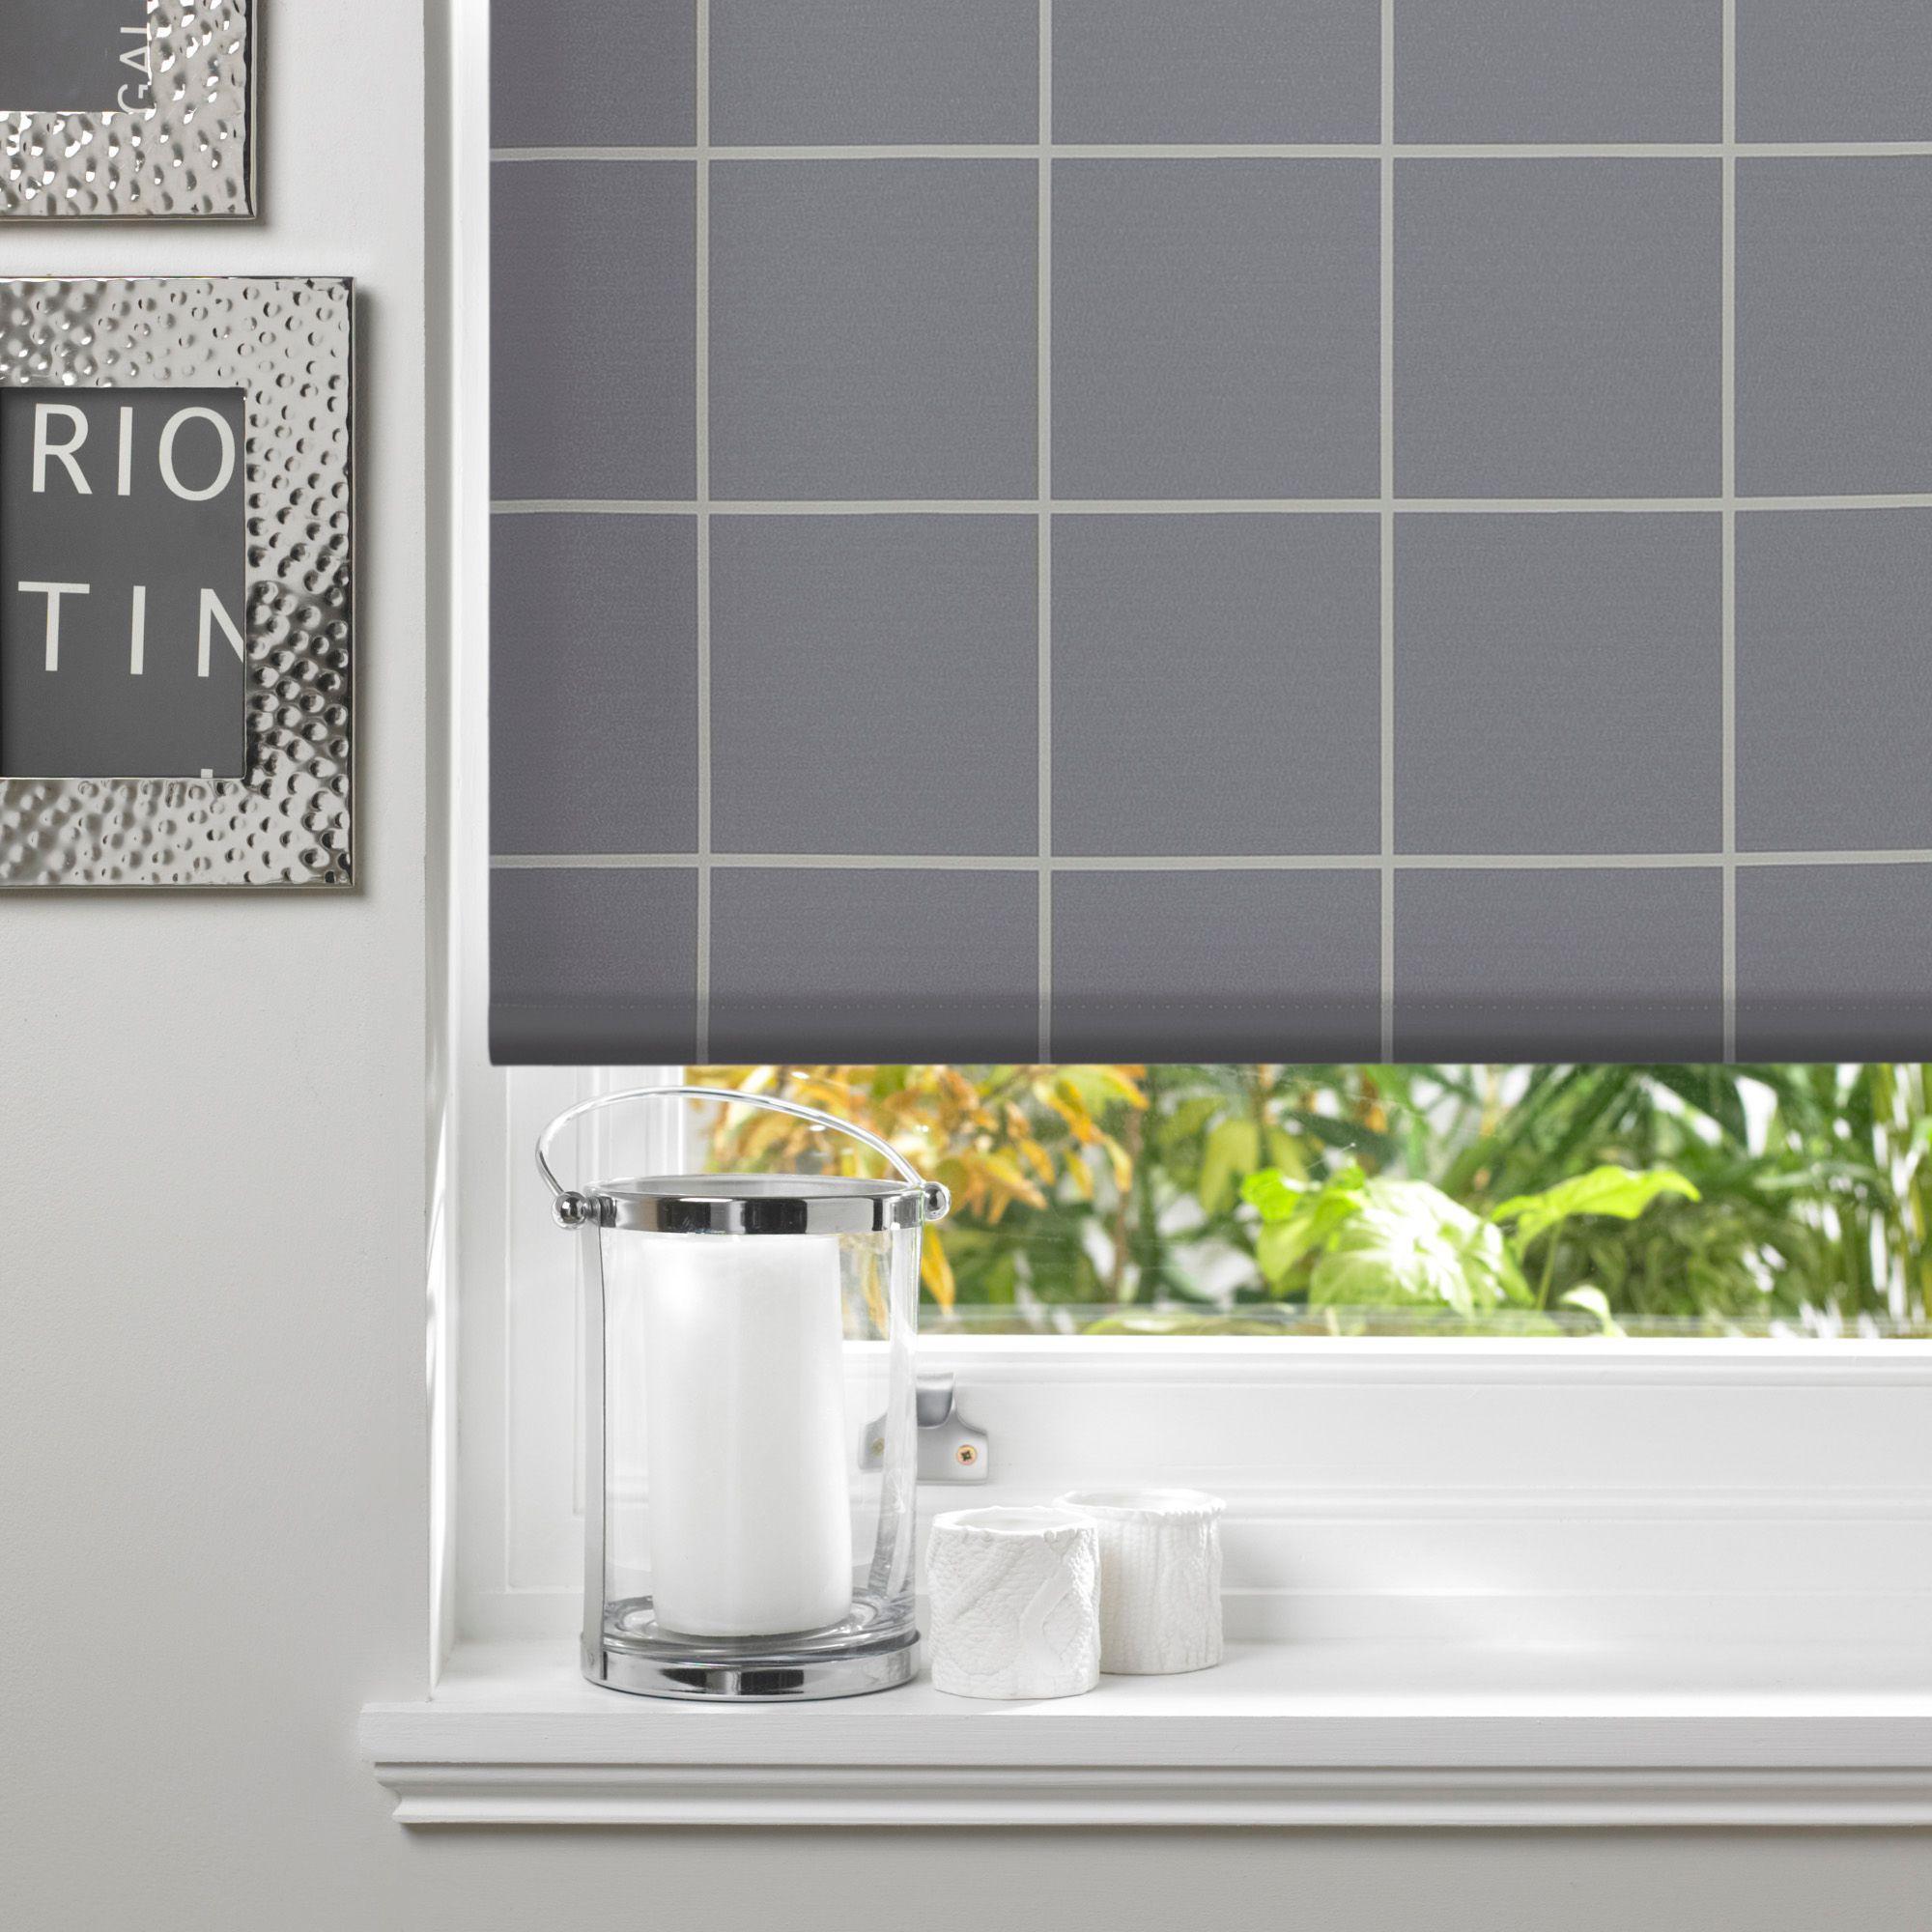 Colours Aylin Corded Grey Roller Blind (l)160 Cm (w)120 Cm